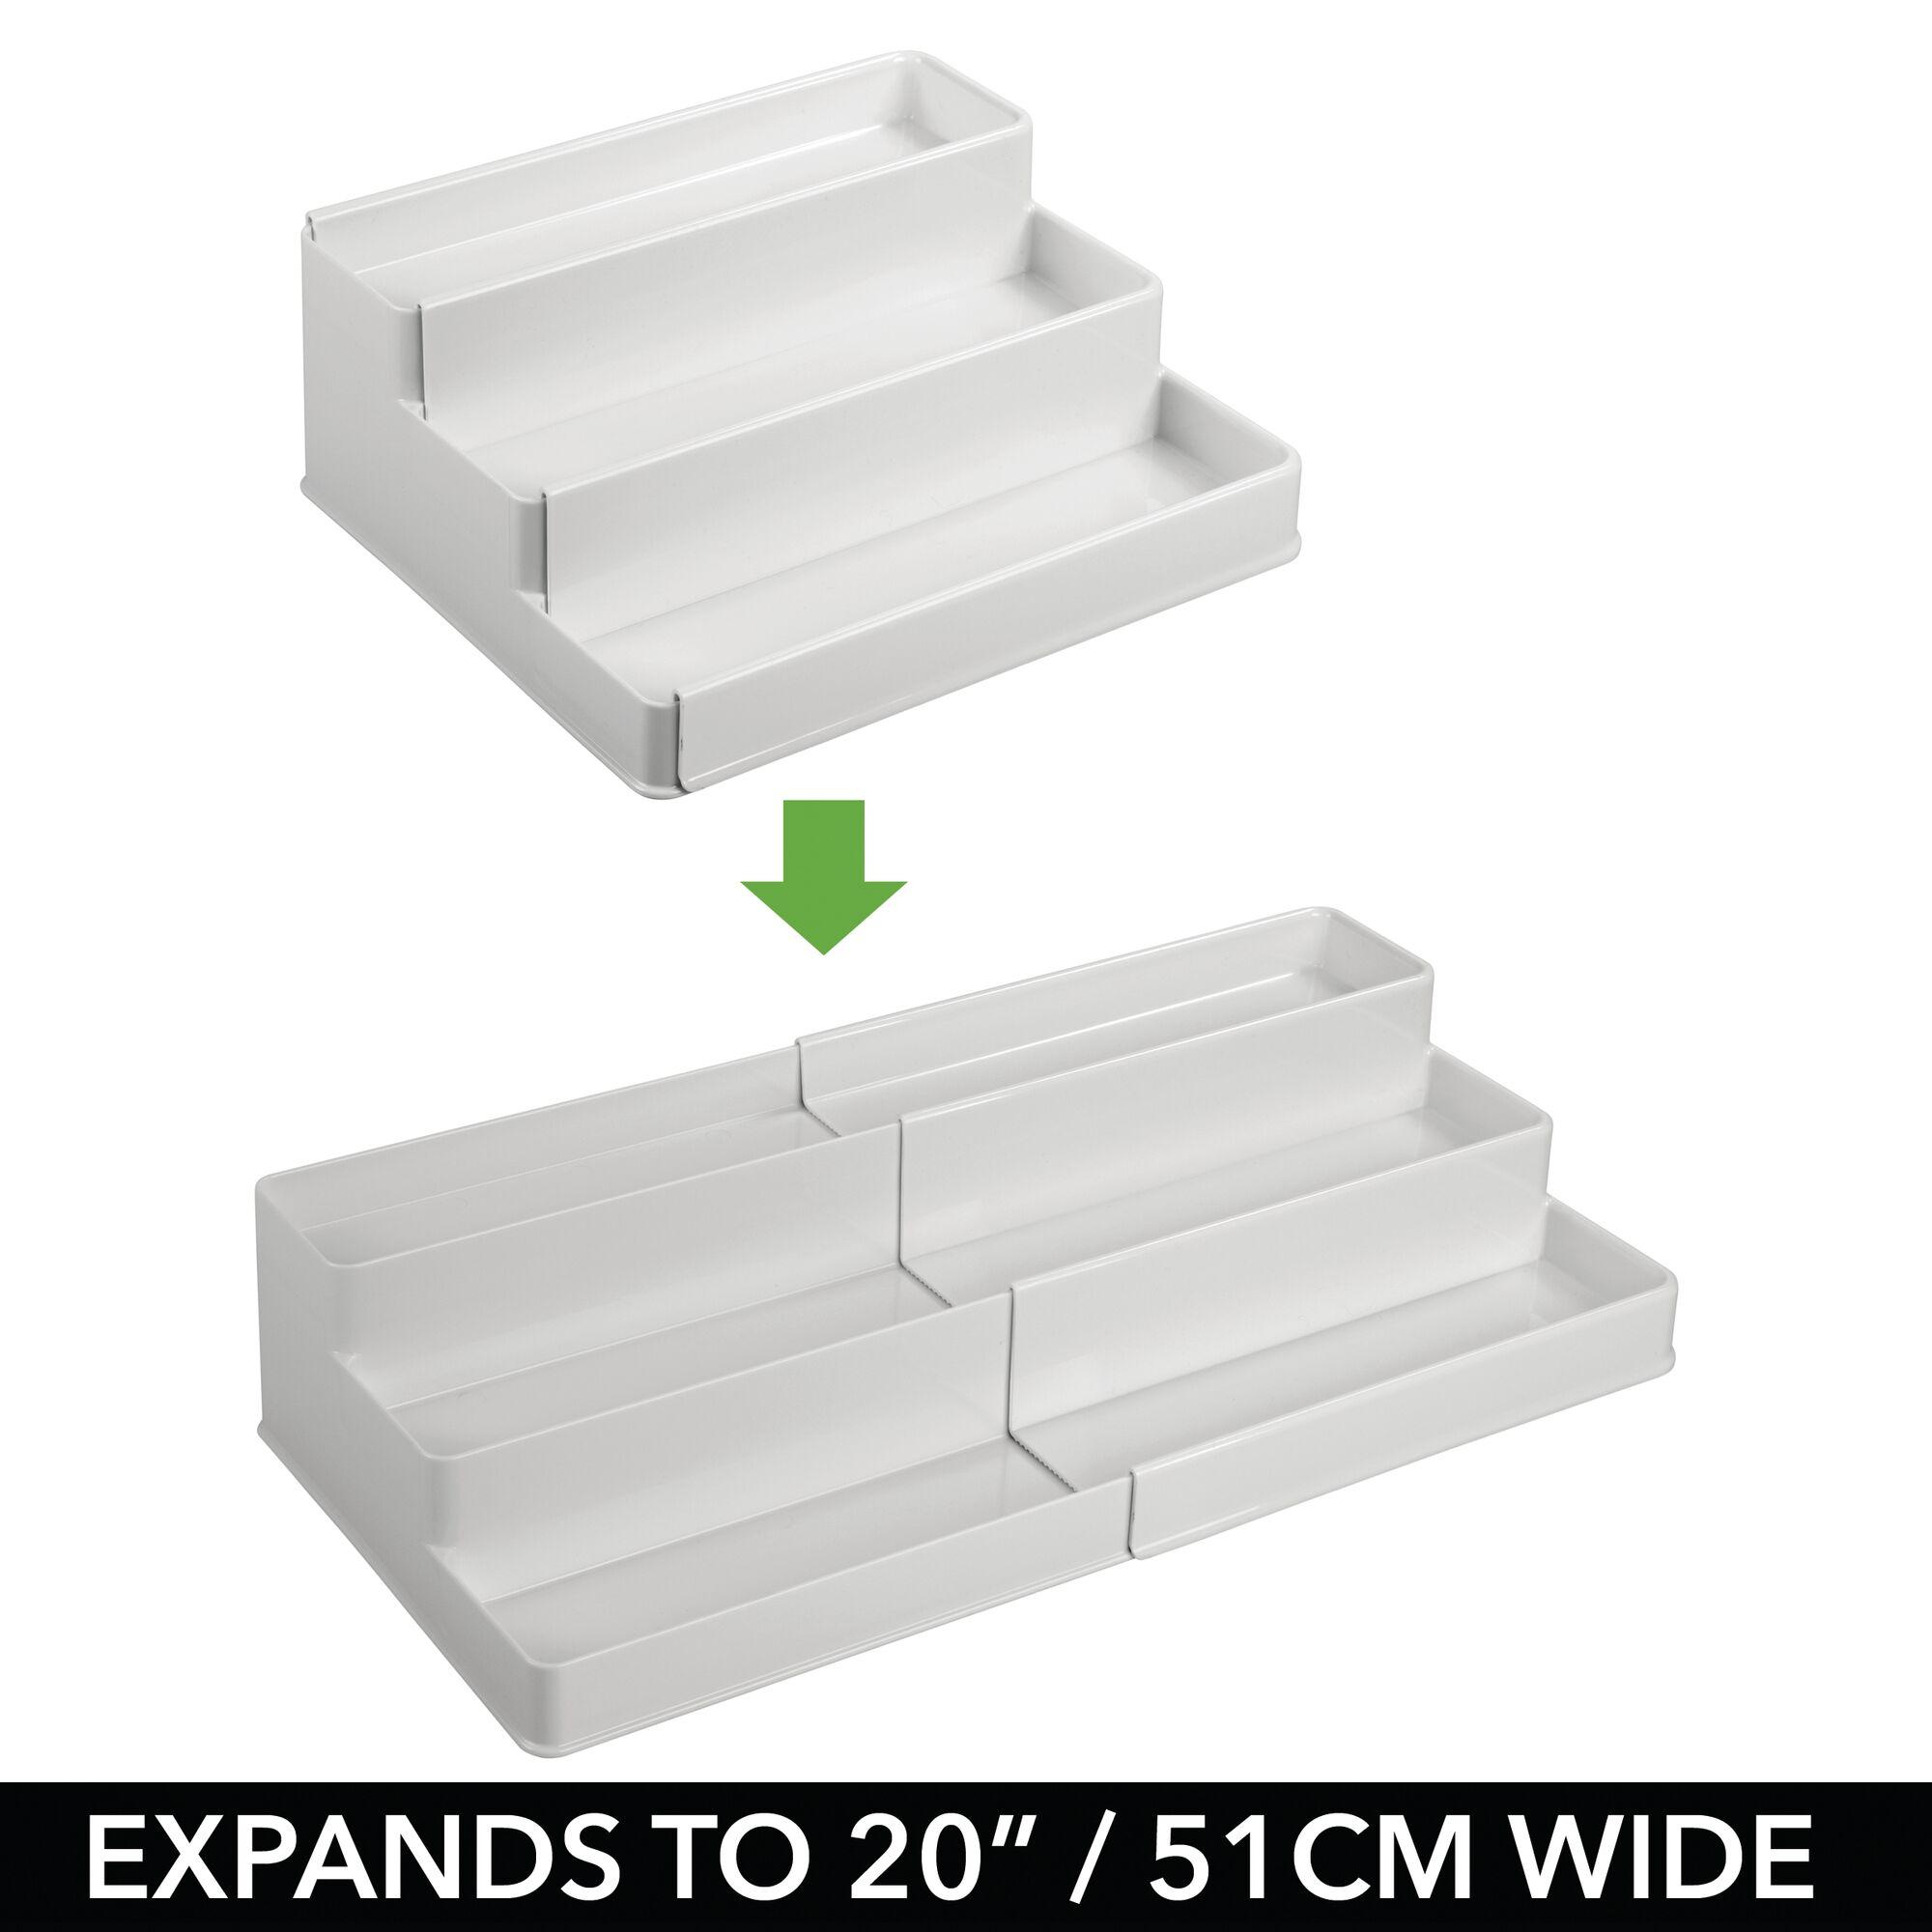 mDesign-Expandable-Kitchen-Cabinet-Pantry-Organizer-Spice-Rack thumbnail 49